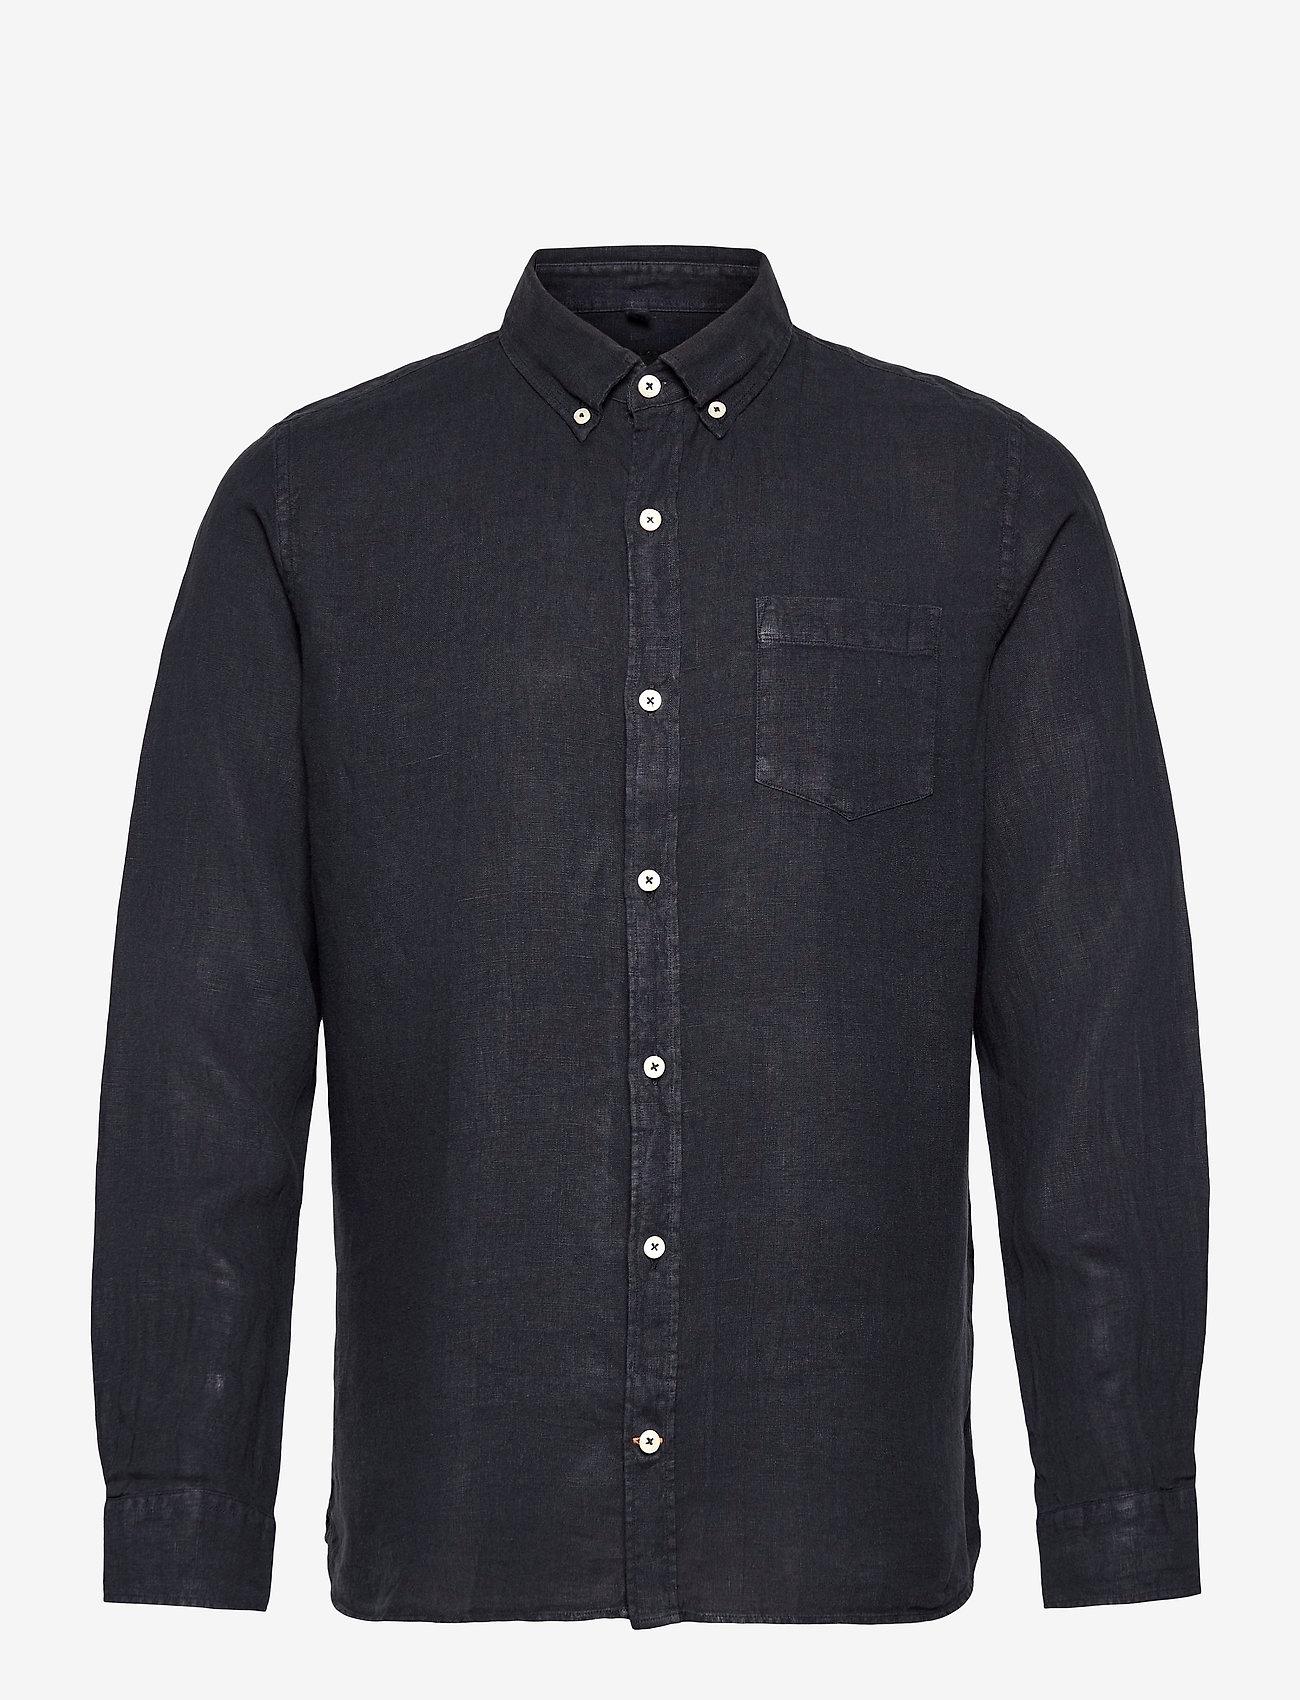 ECOALF - MALIBU SHIRT MAN - chemises à carreaux - navy - 0